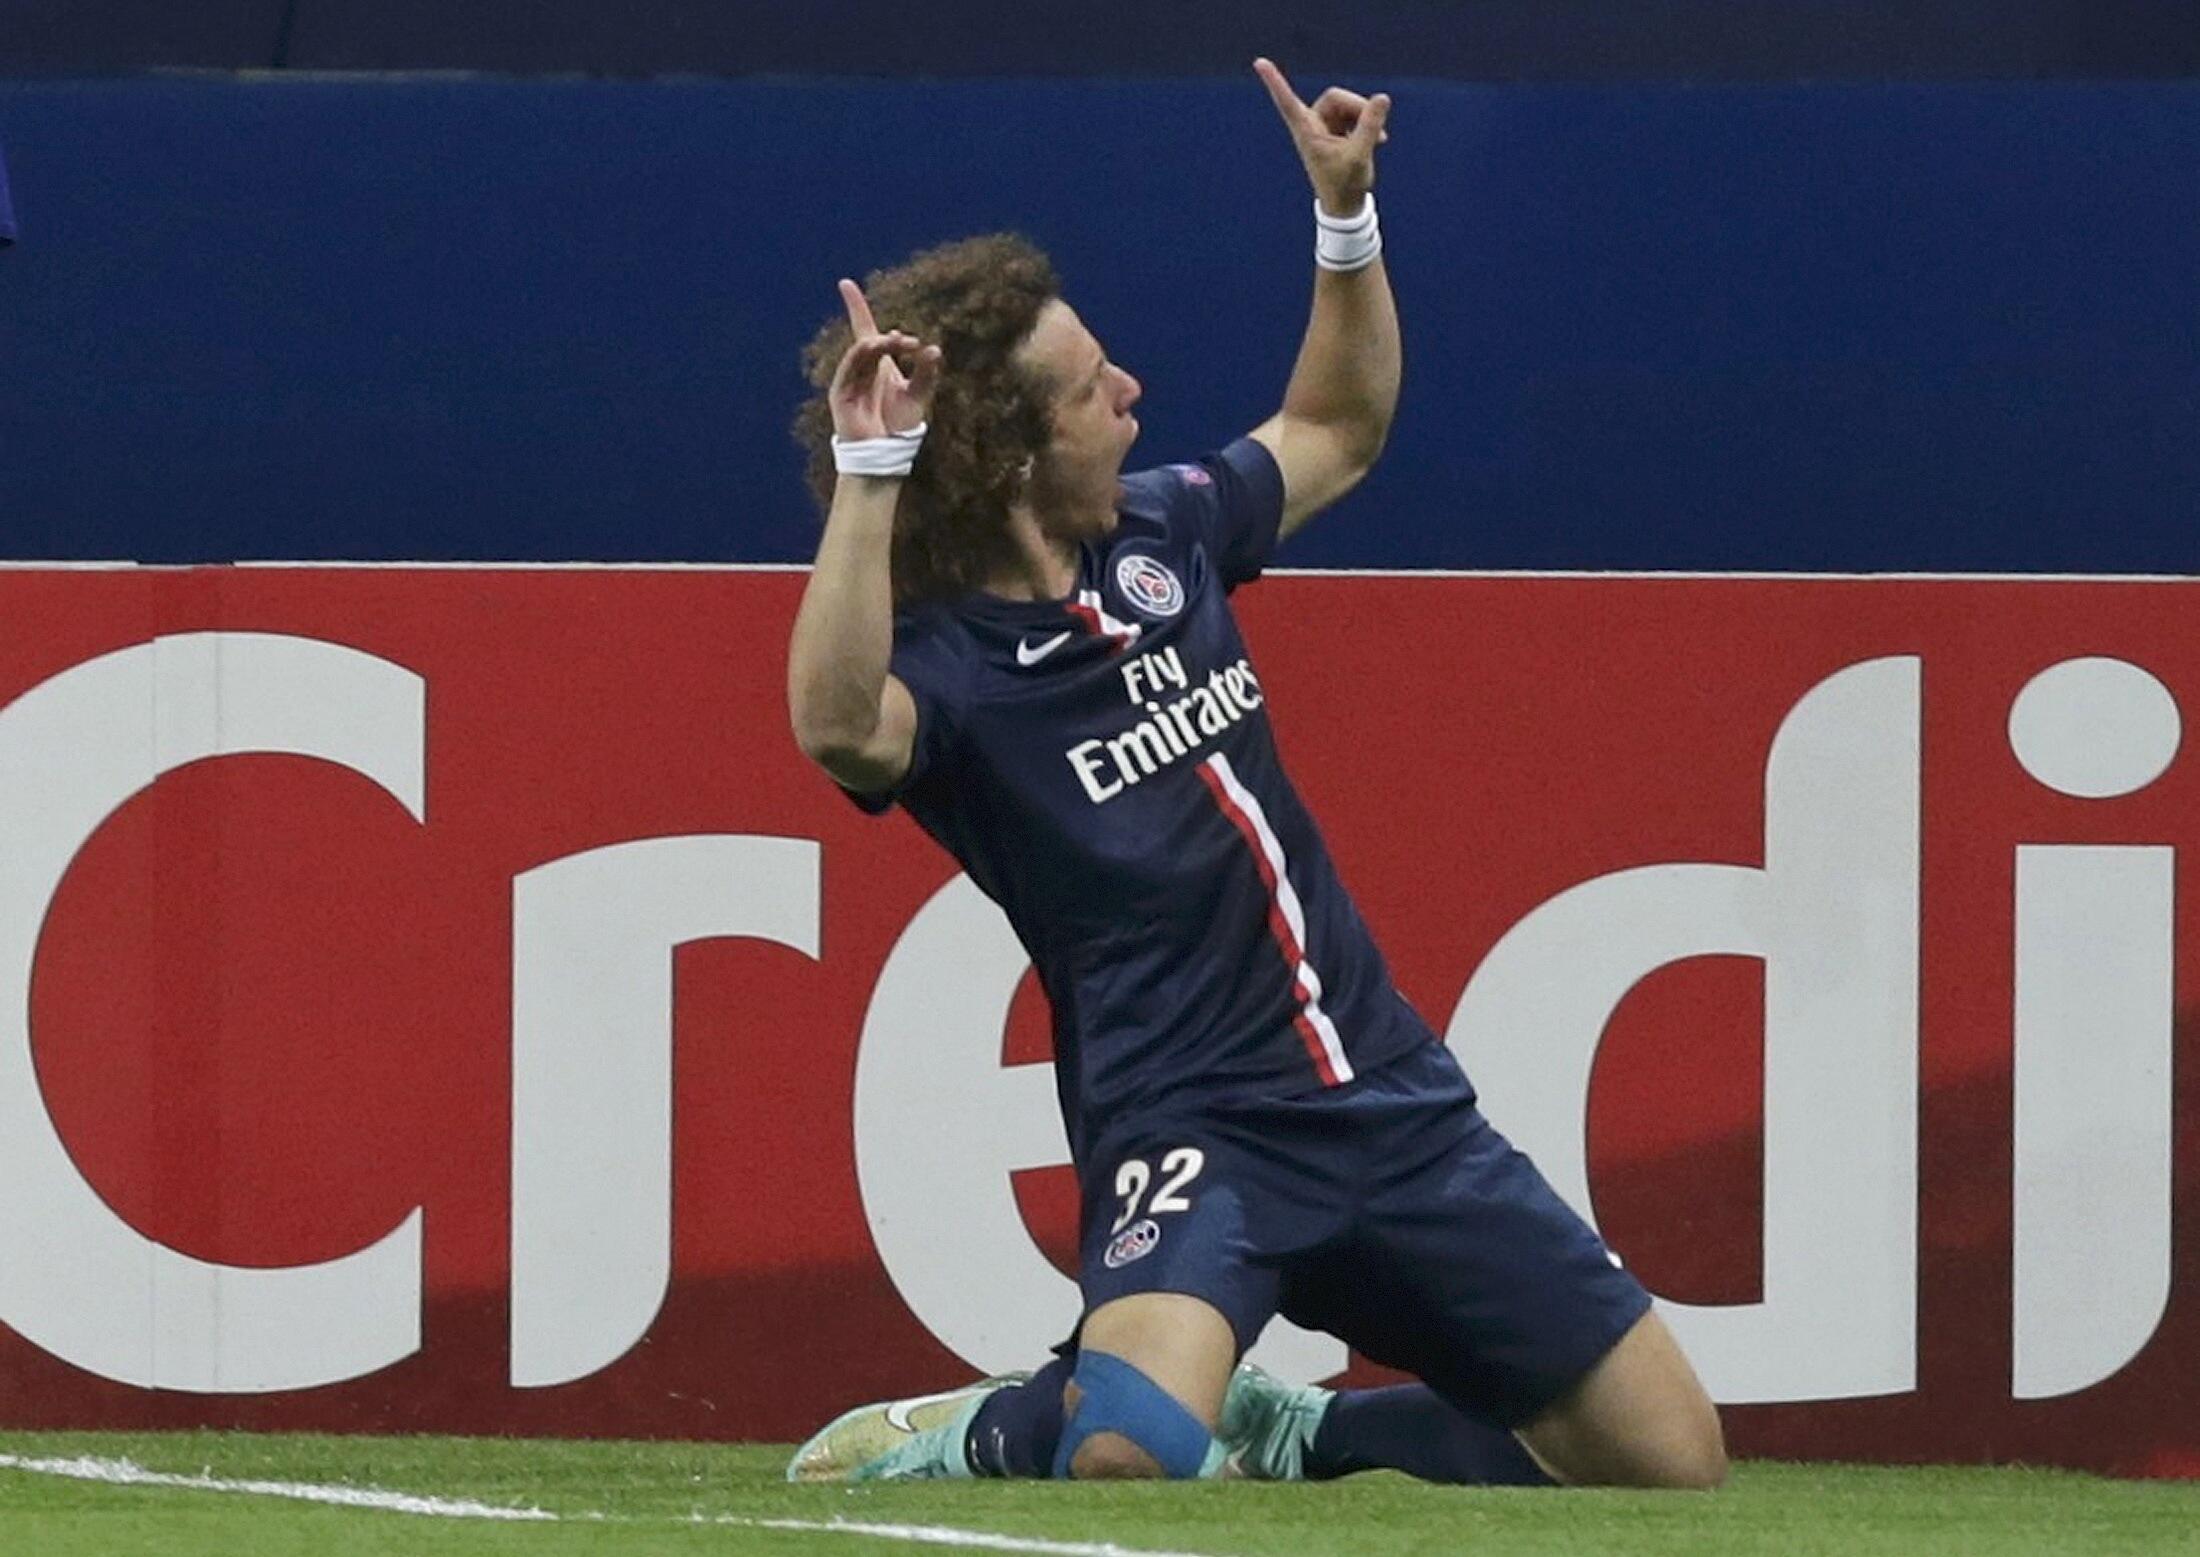 David Luiz marcou o primeiro gol da partida do PSG contra o Barcelona (3-2).